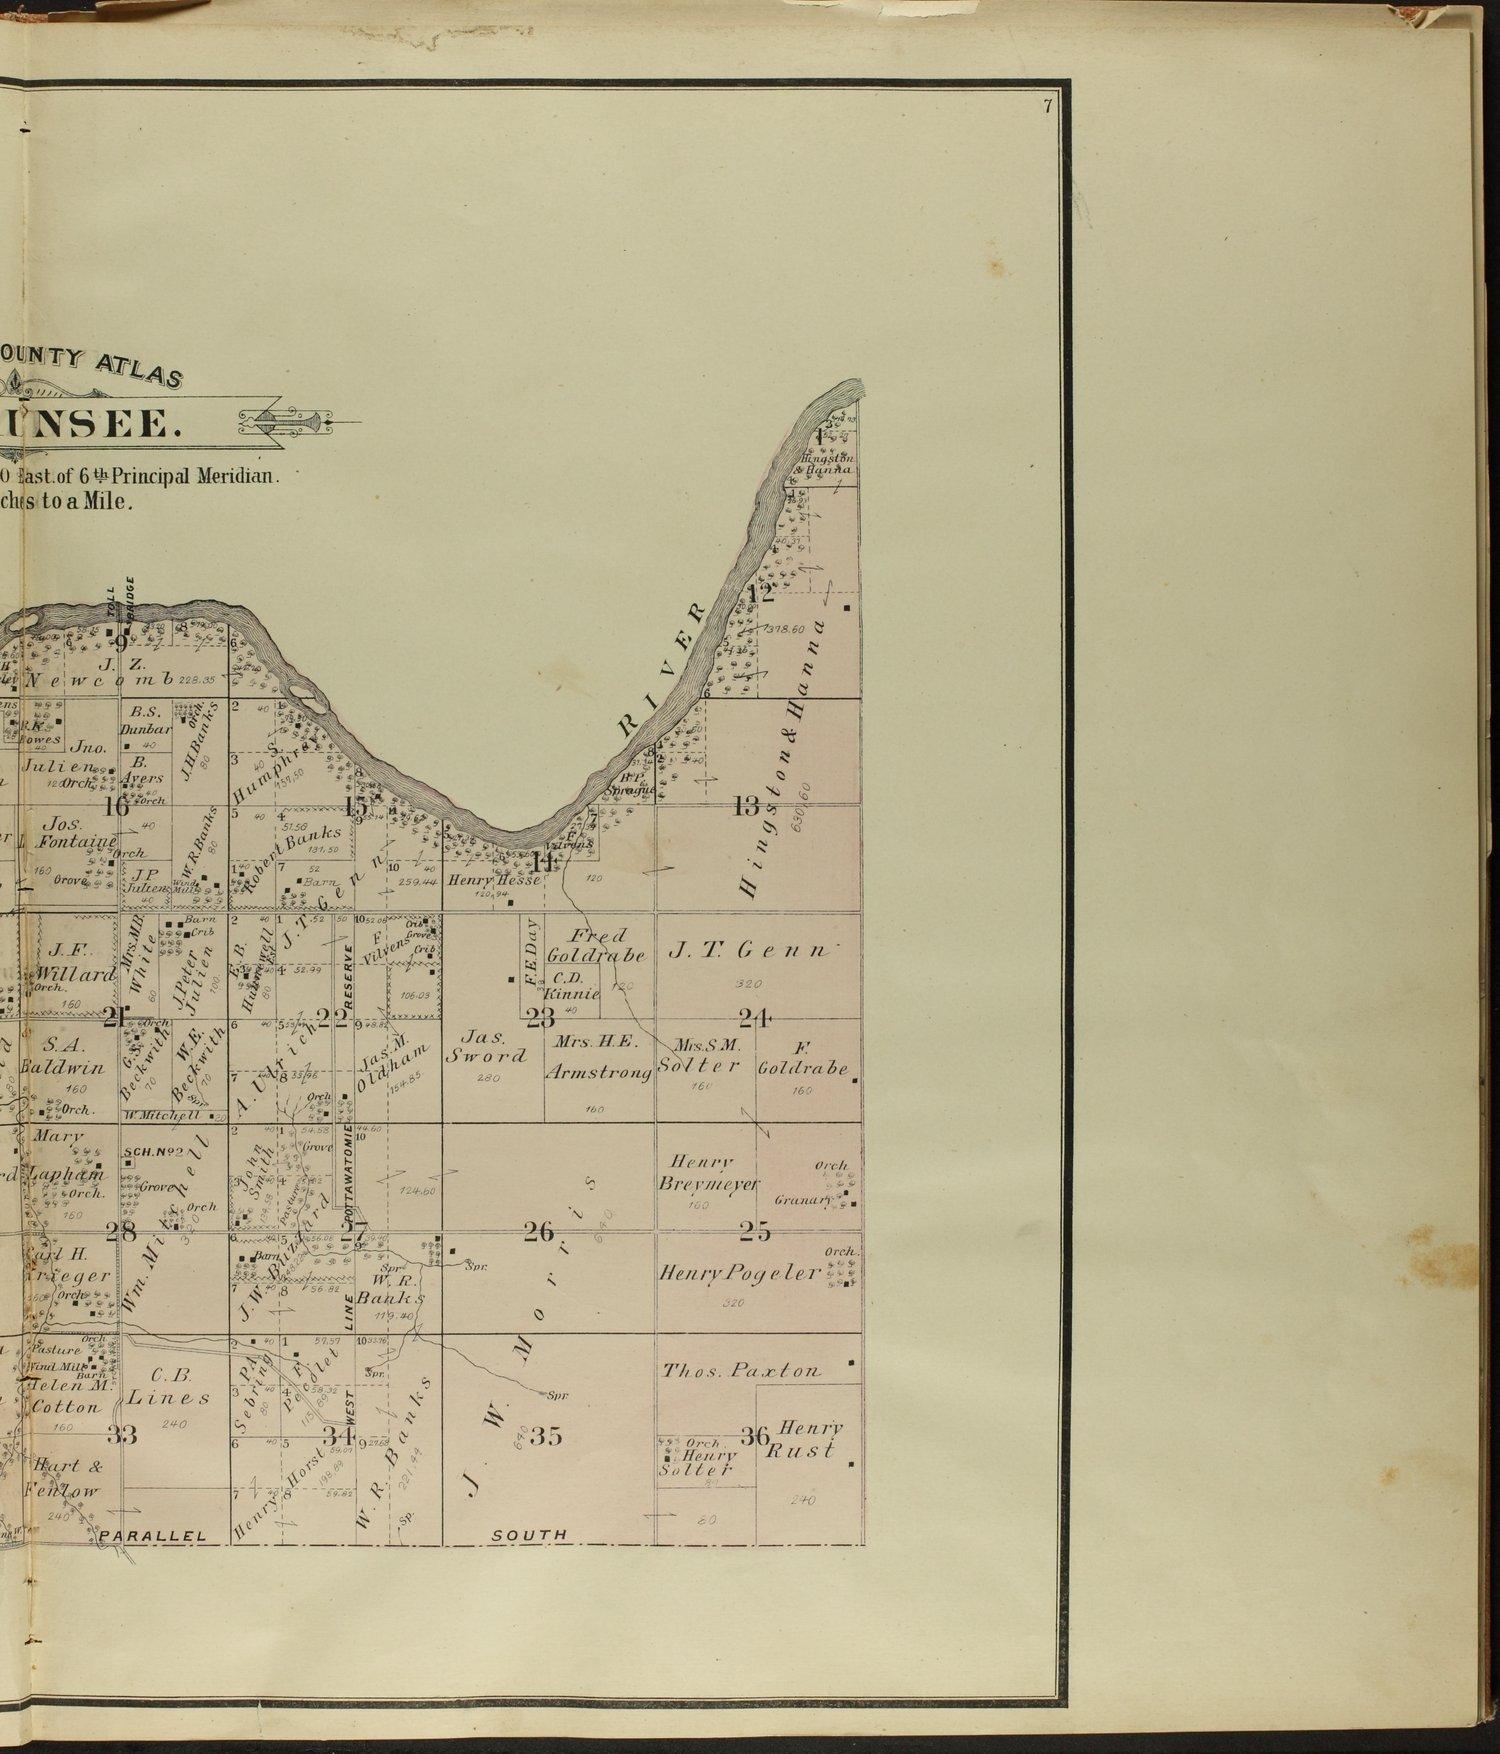 Atlas of Wabaunsee County, Kansas - 7